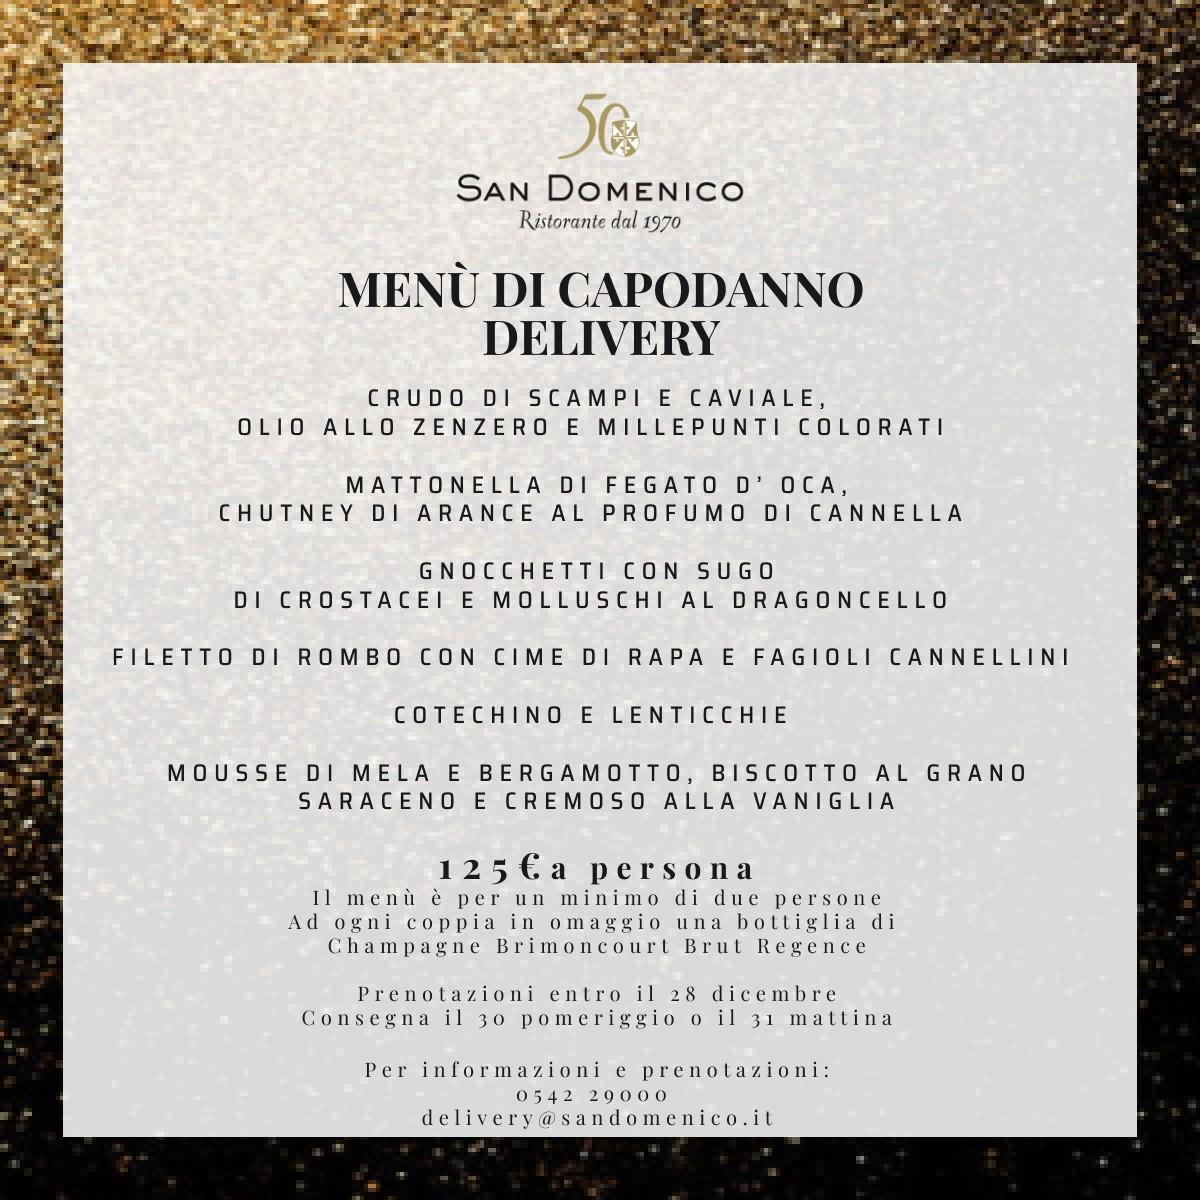 https://www.romagnaatavola.it/wp-content/uploads/romagnaatavola.it/2020/12/Ristorante-San-Domenico-di-Imola-Menu-Capodanno-2020-Delivery.jpg